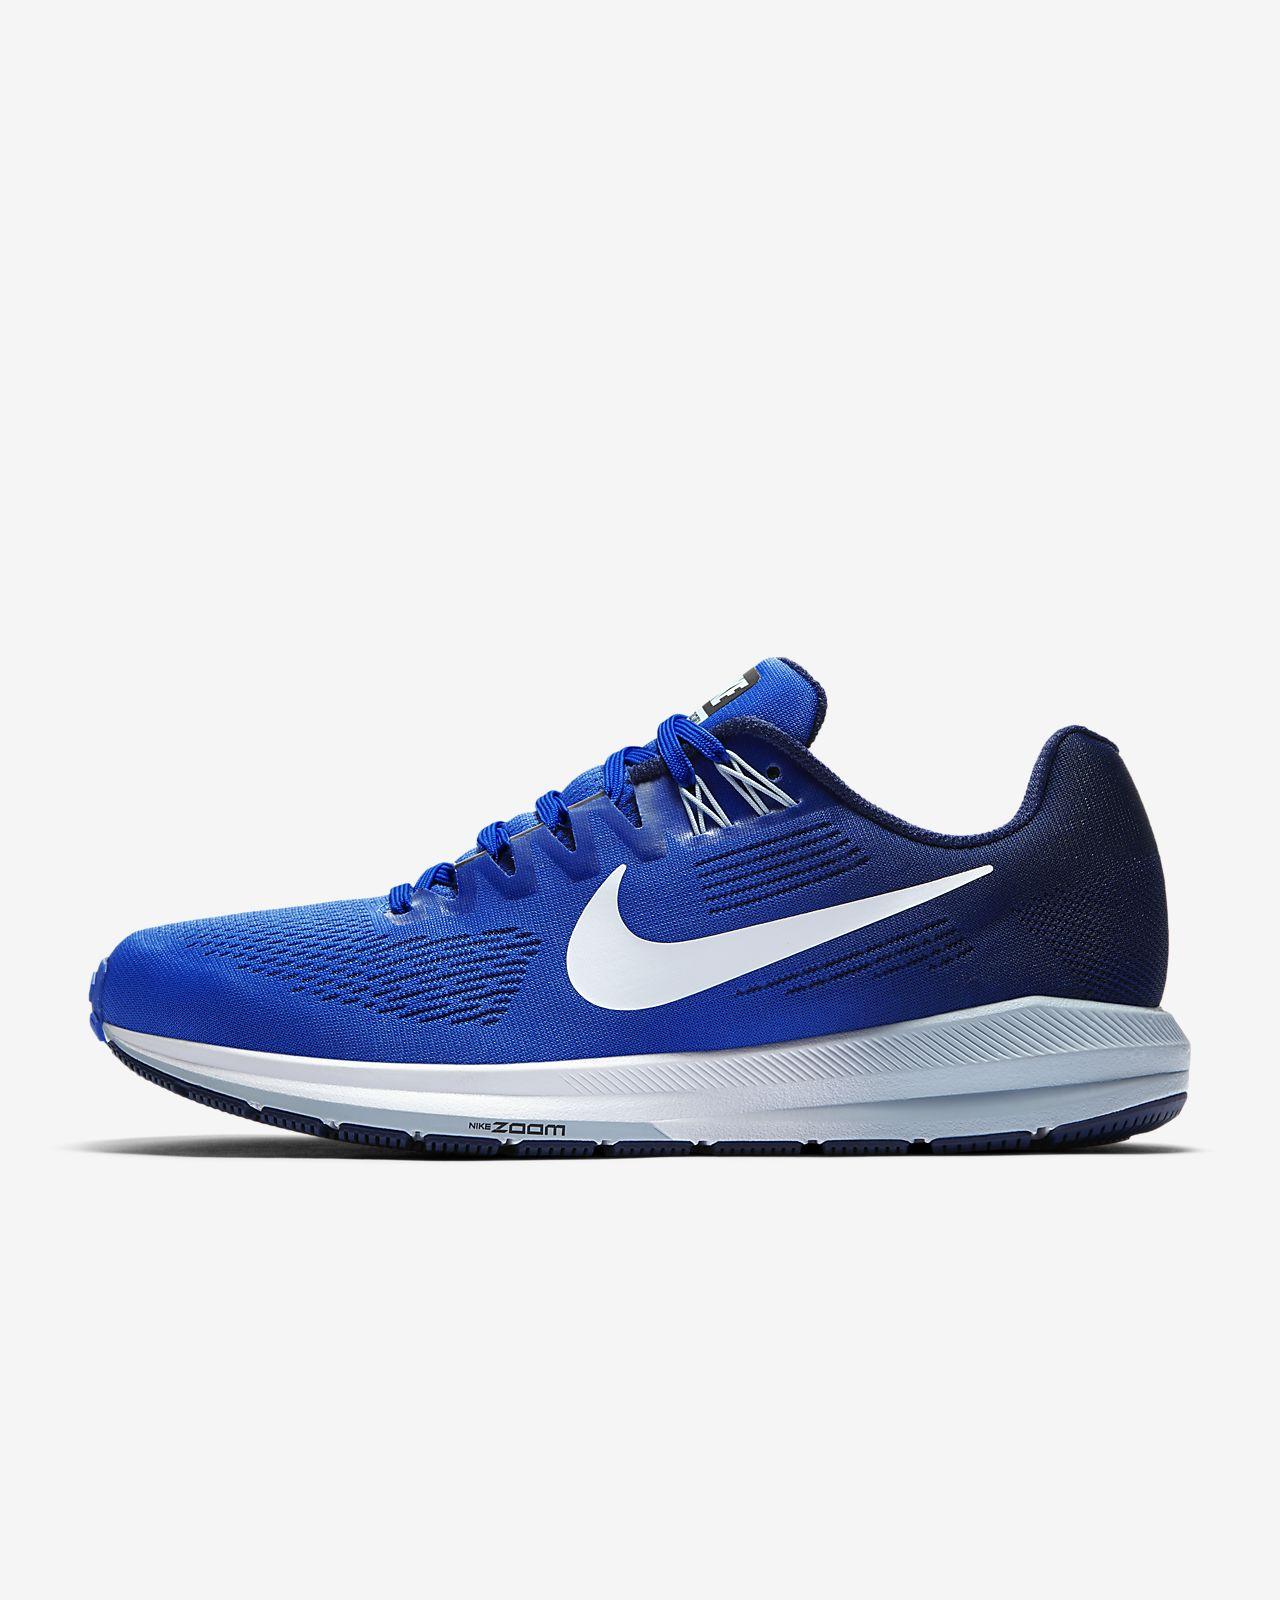 Calzado de running para hombre Nike Air Zoom Structure 21